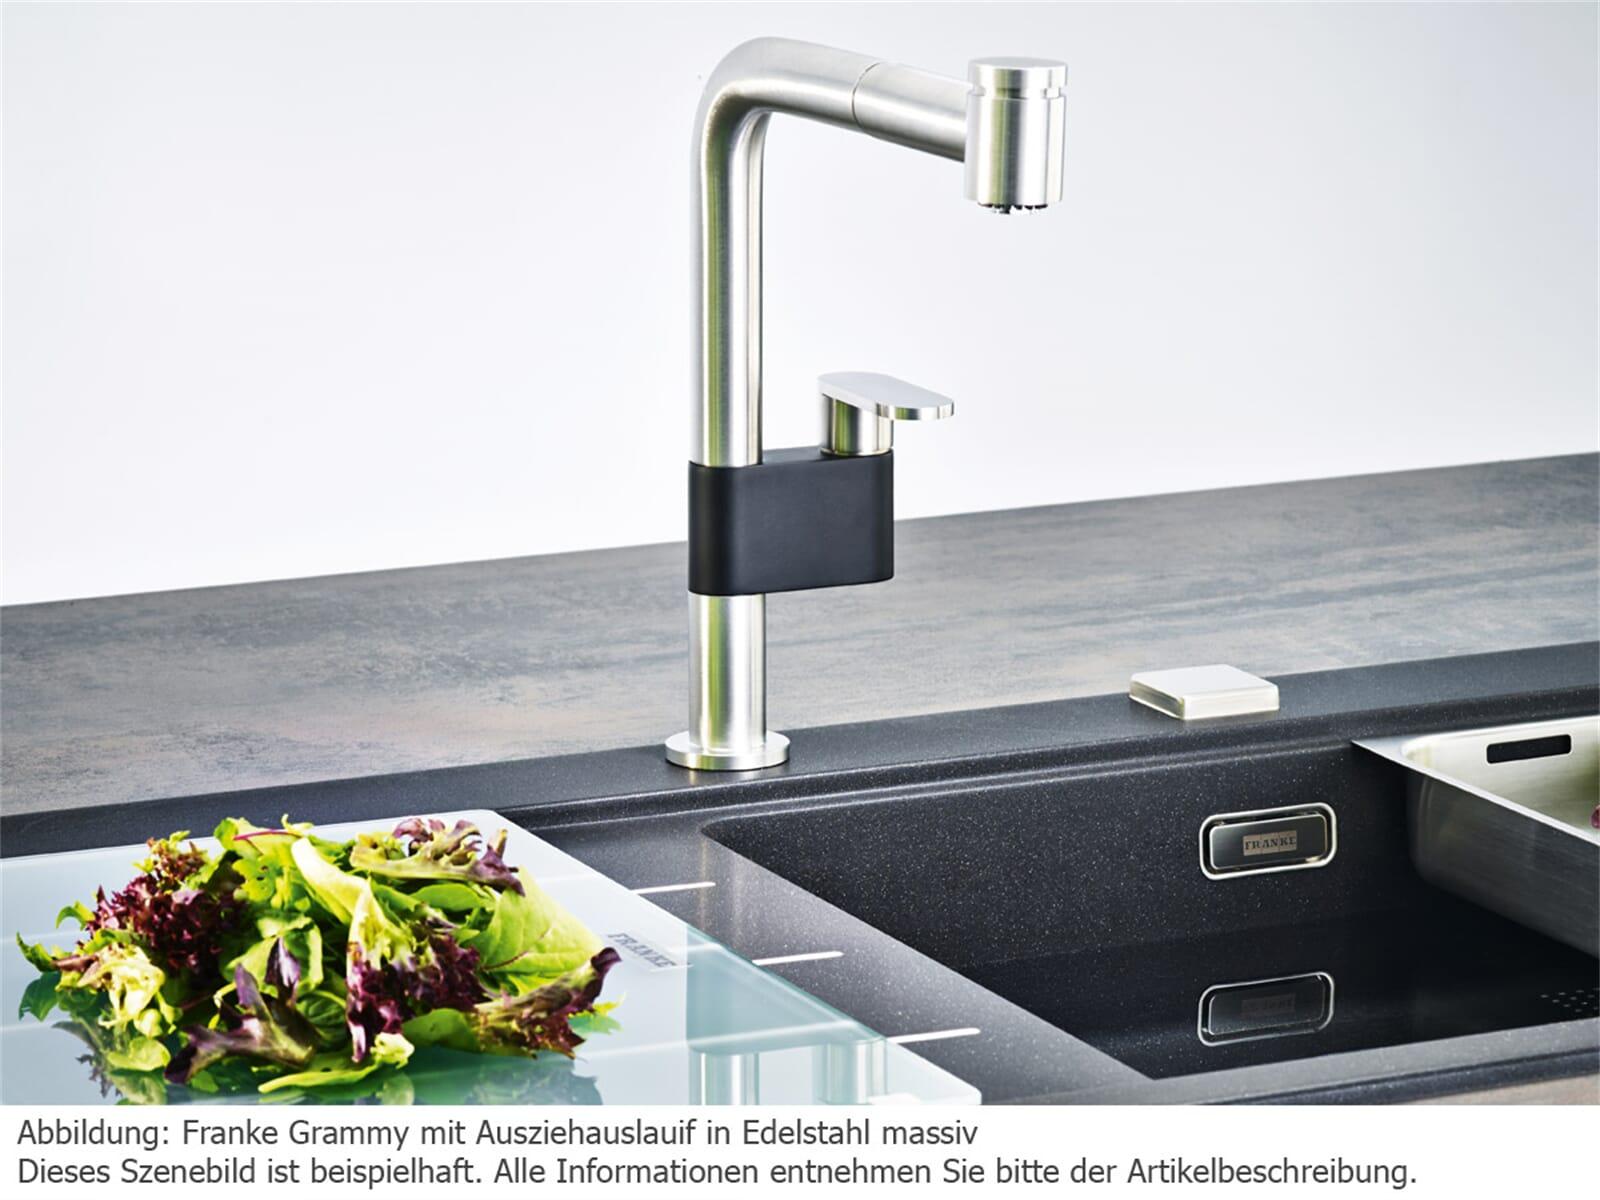 franke grammy chrom hochdruckarmatur. Black Bedroom Furniture Sets. Home Design Ideas